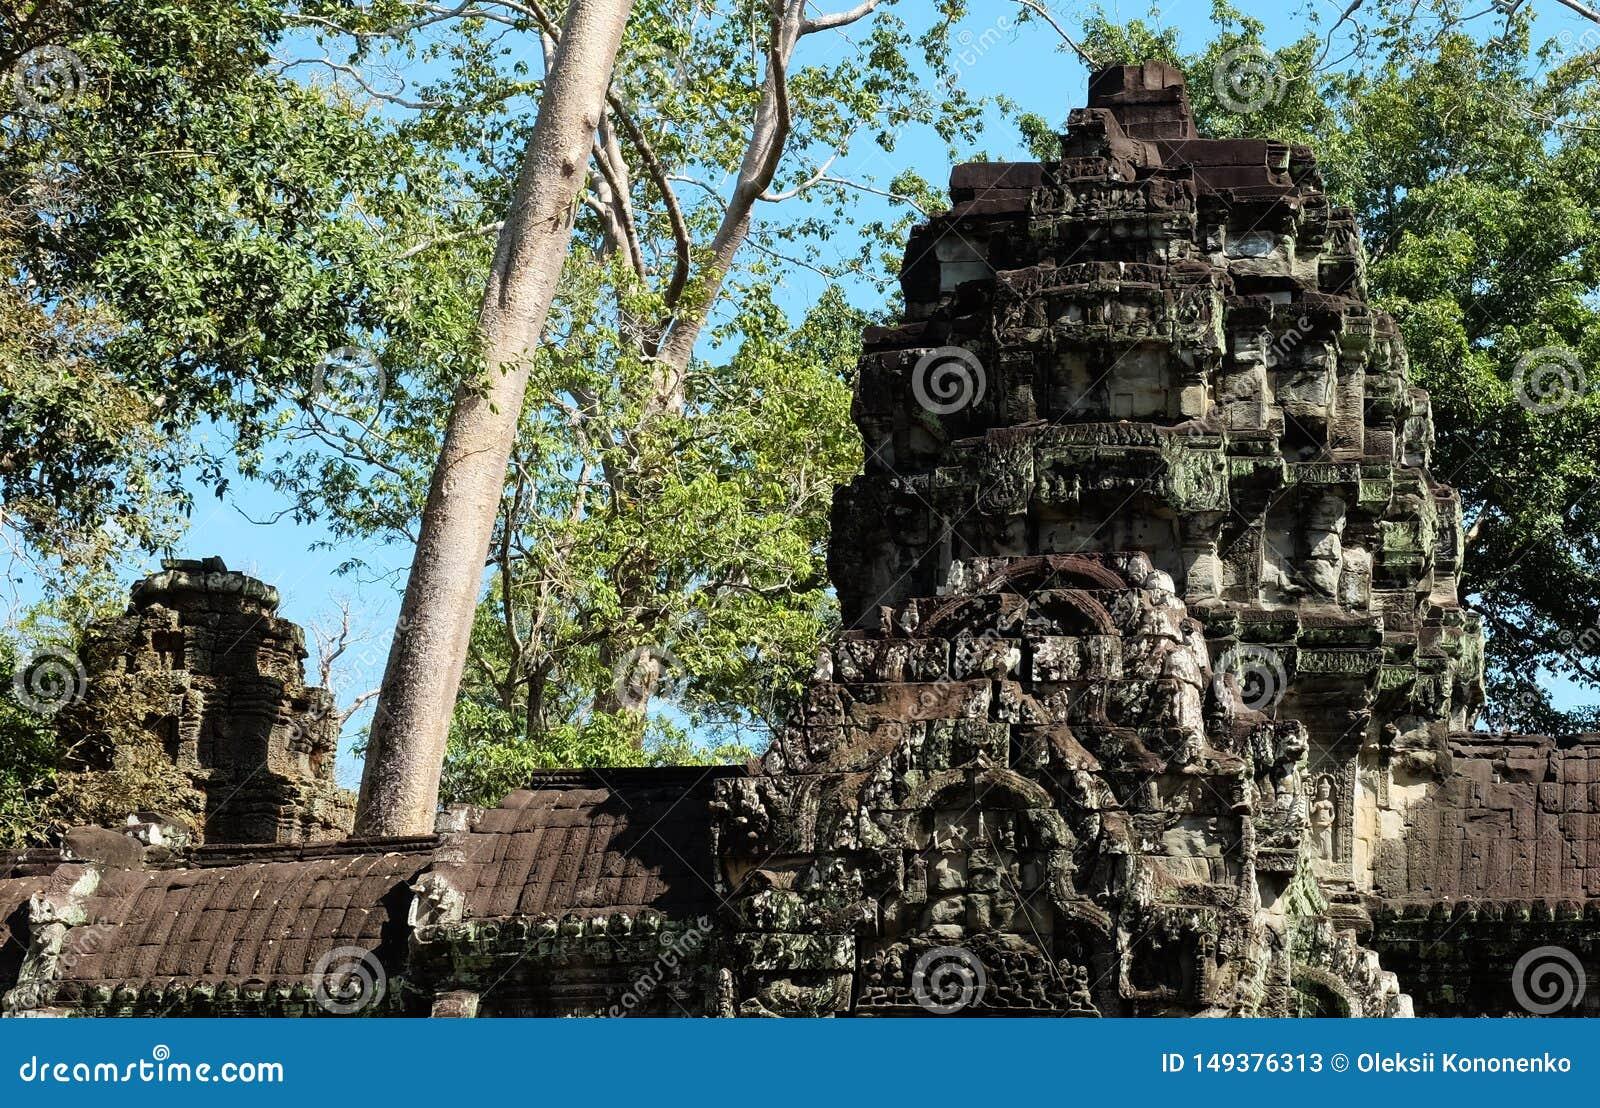 E Αρχιτεκτονική κληρονομιά της Khmer αυτοκρατορίας r